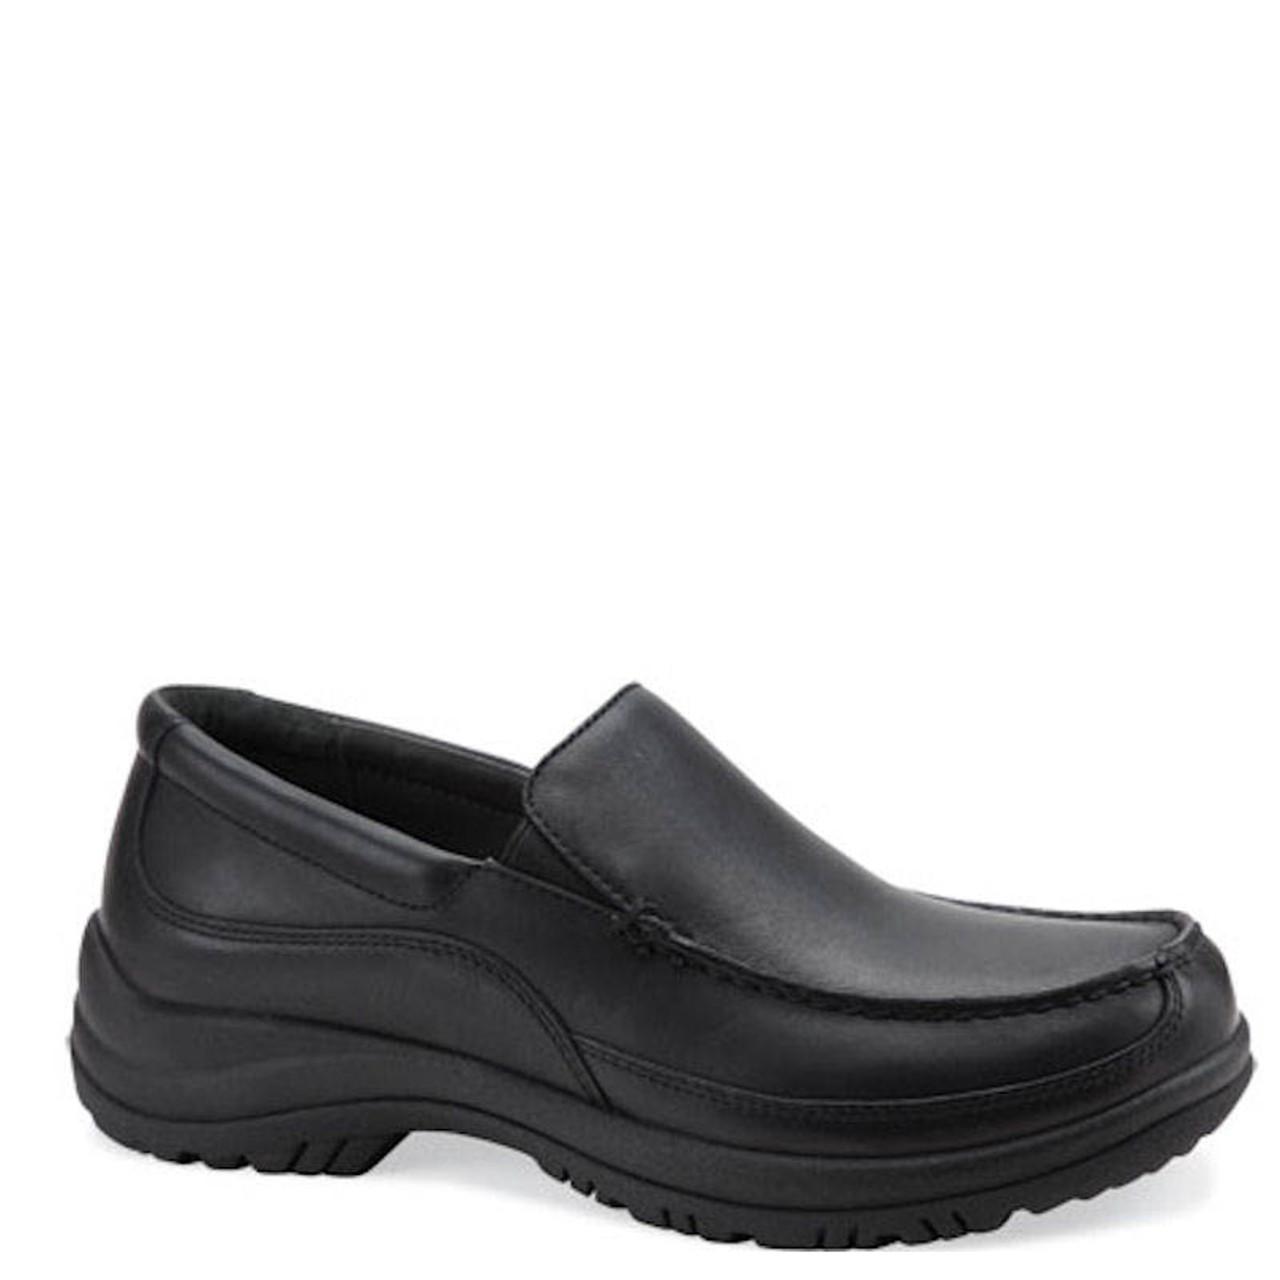 Dansko WAYNE Black Leather Slip-On